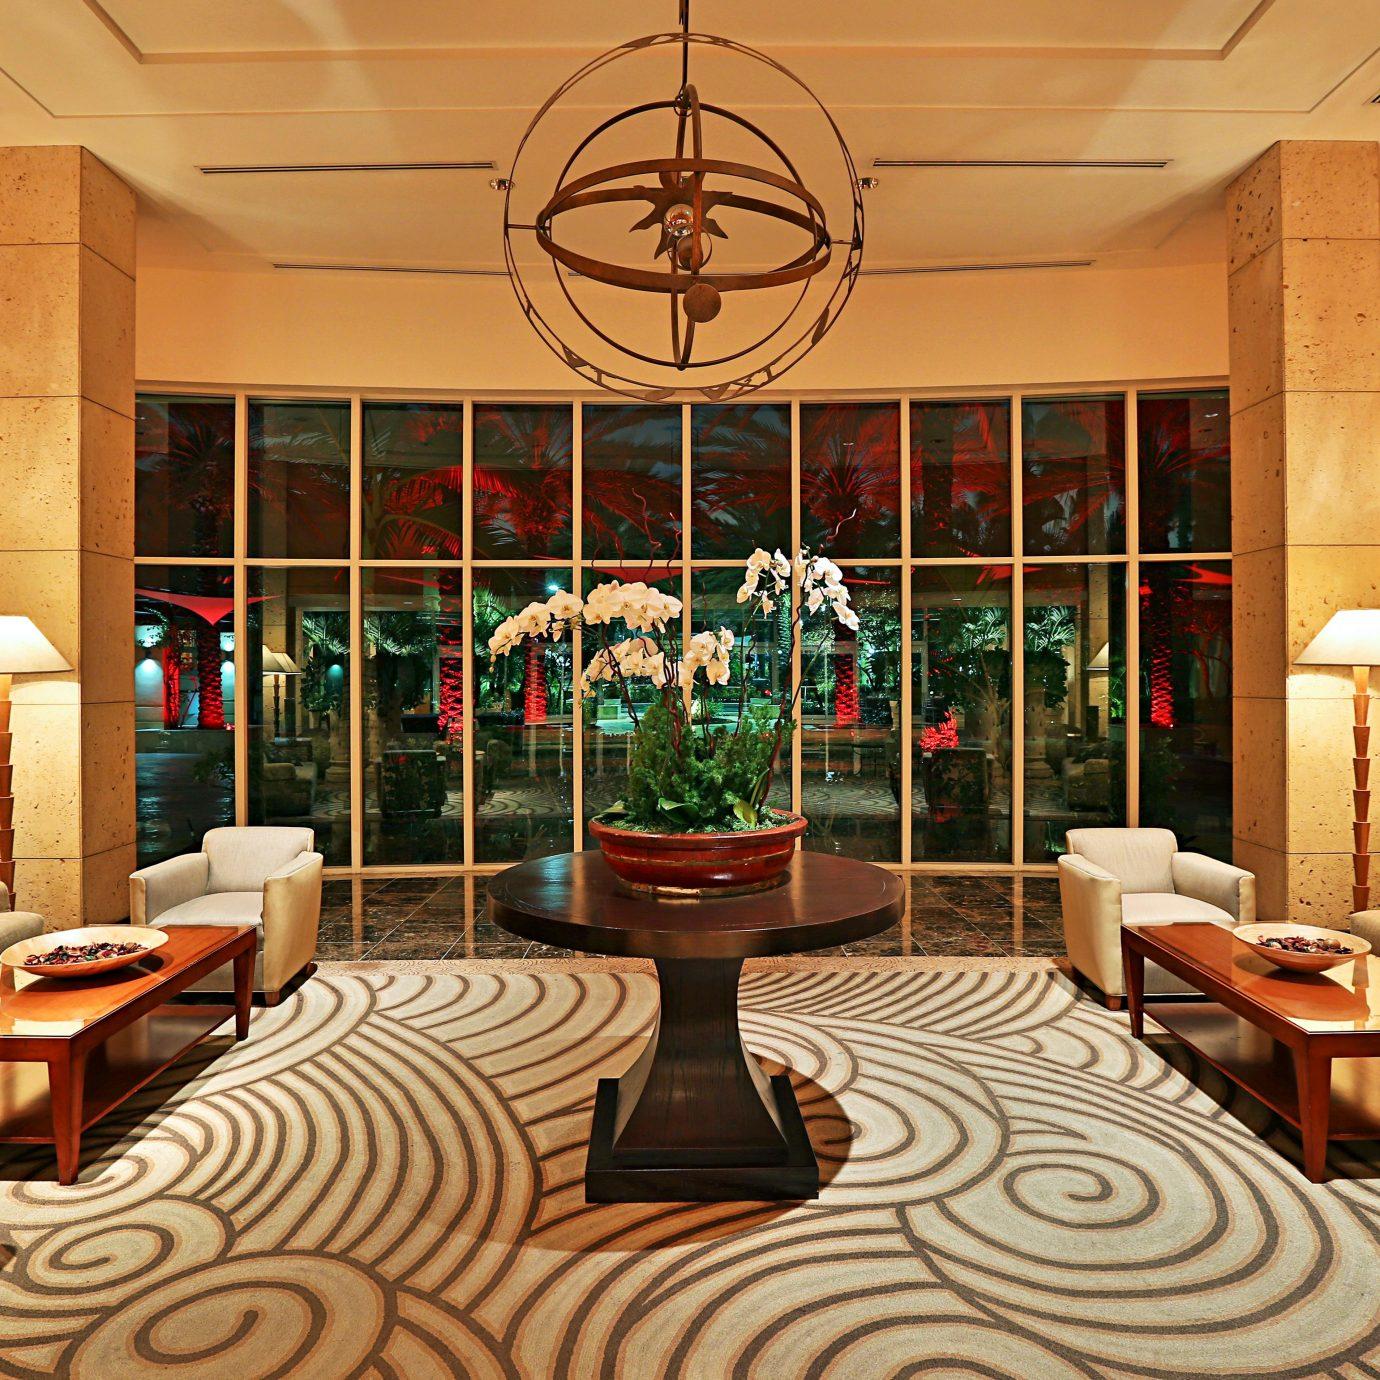 Classic Lounge Resort Lobby property living room home condominium mansion